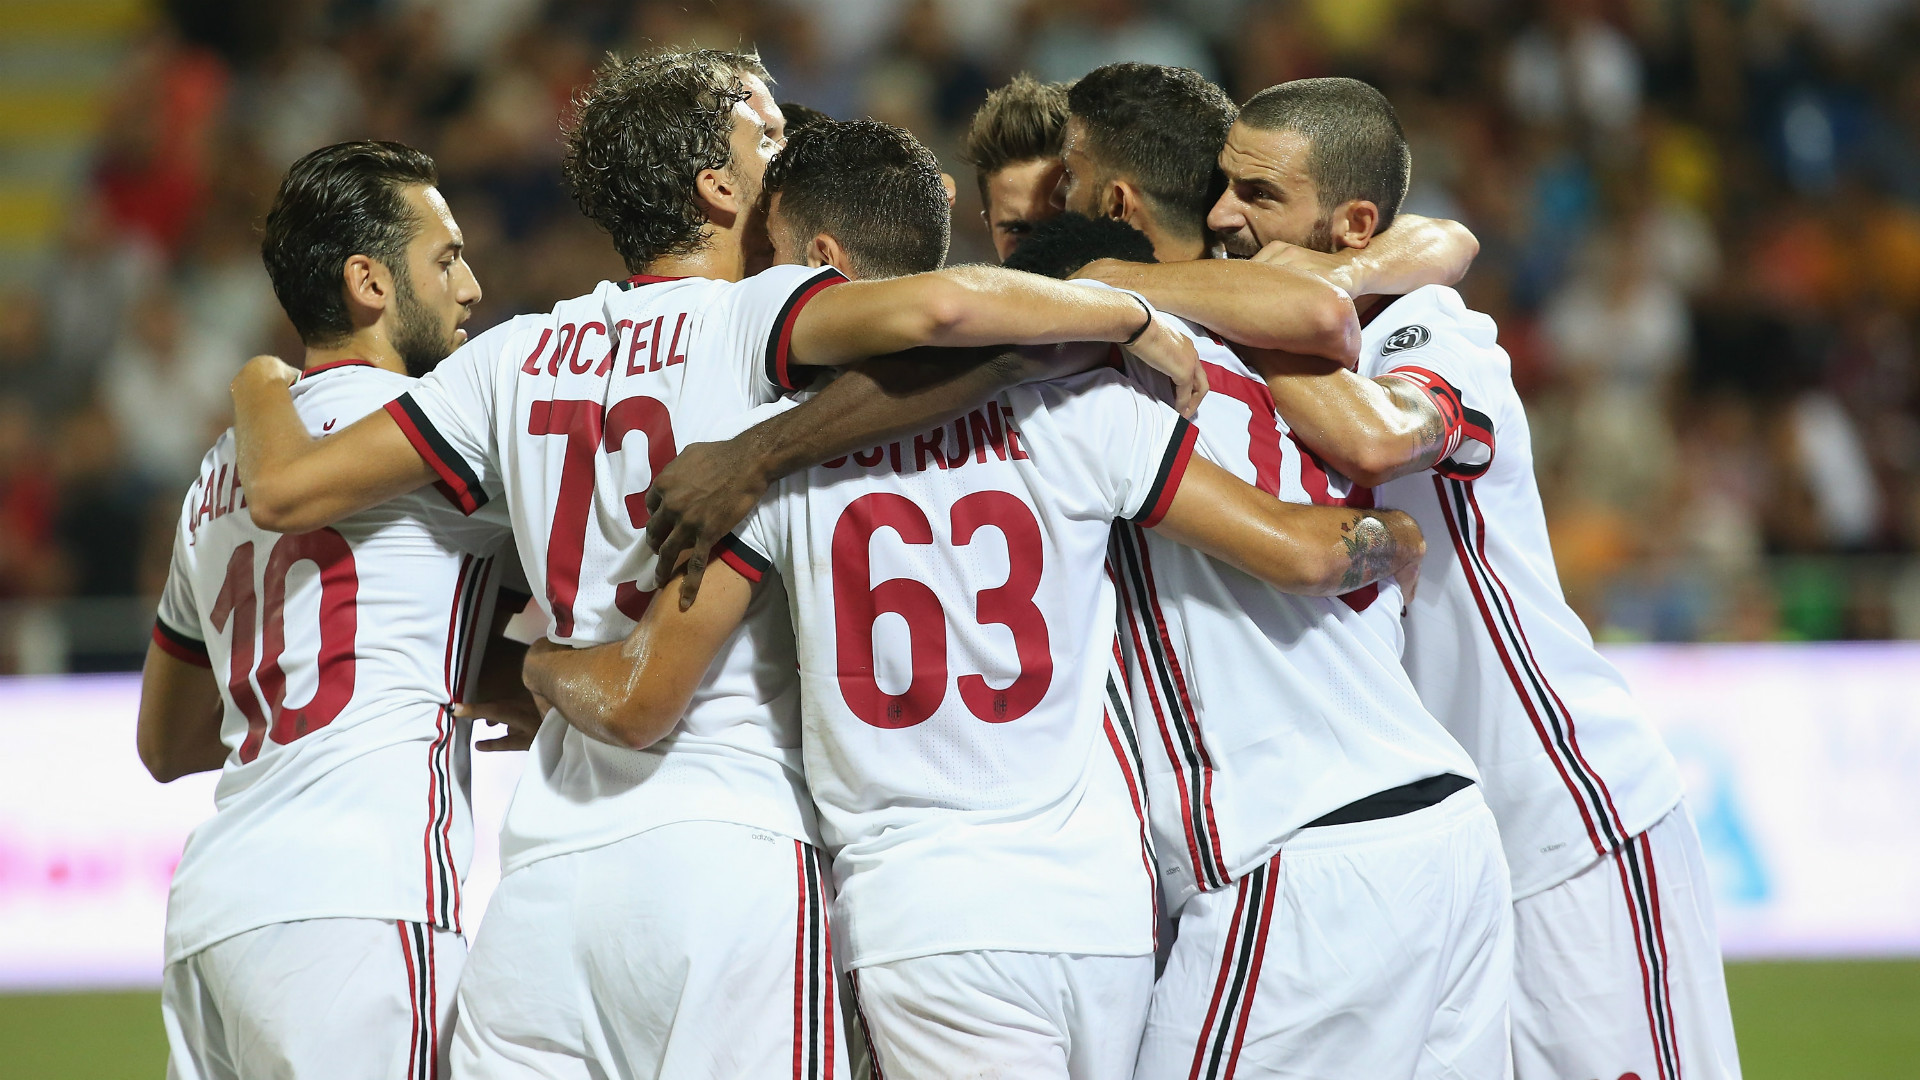 C'è lo Shkendija, Montella vara un nuovo Milan: